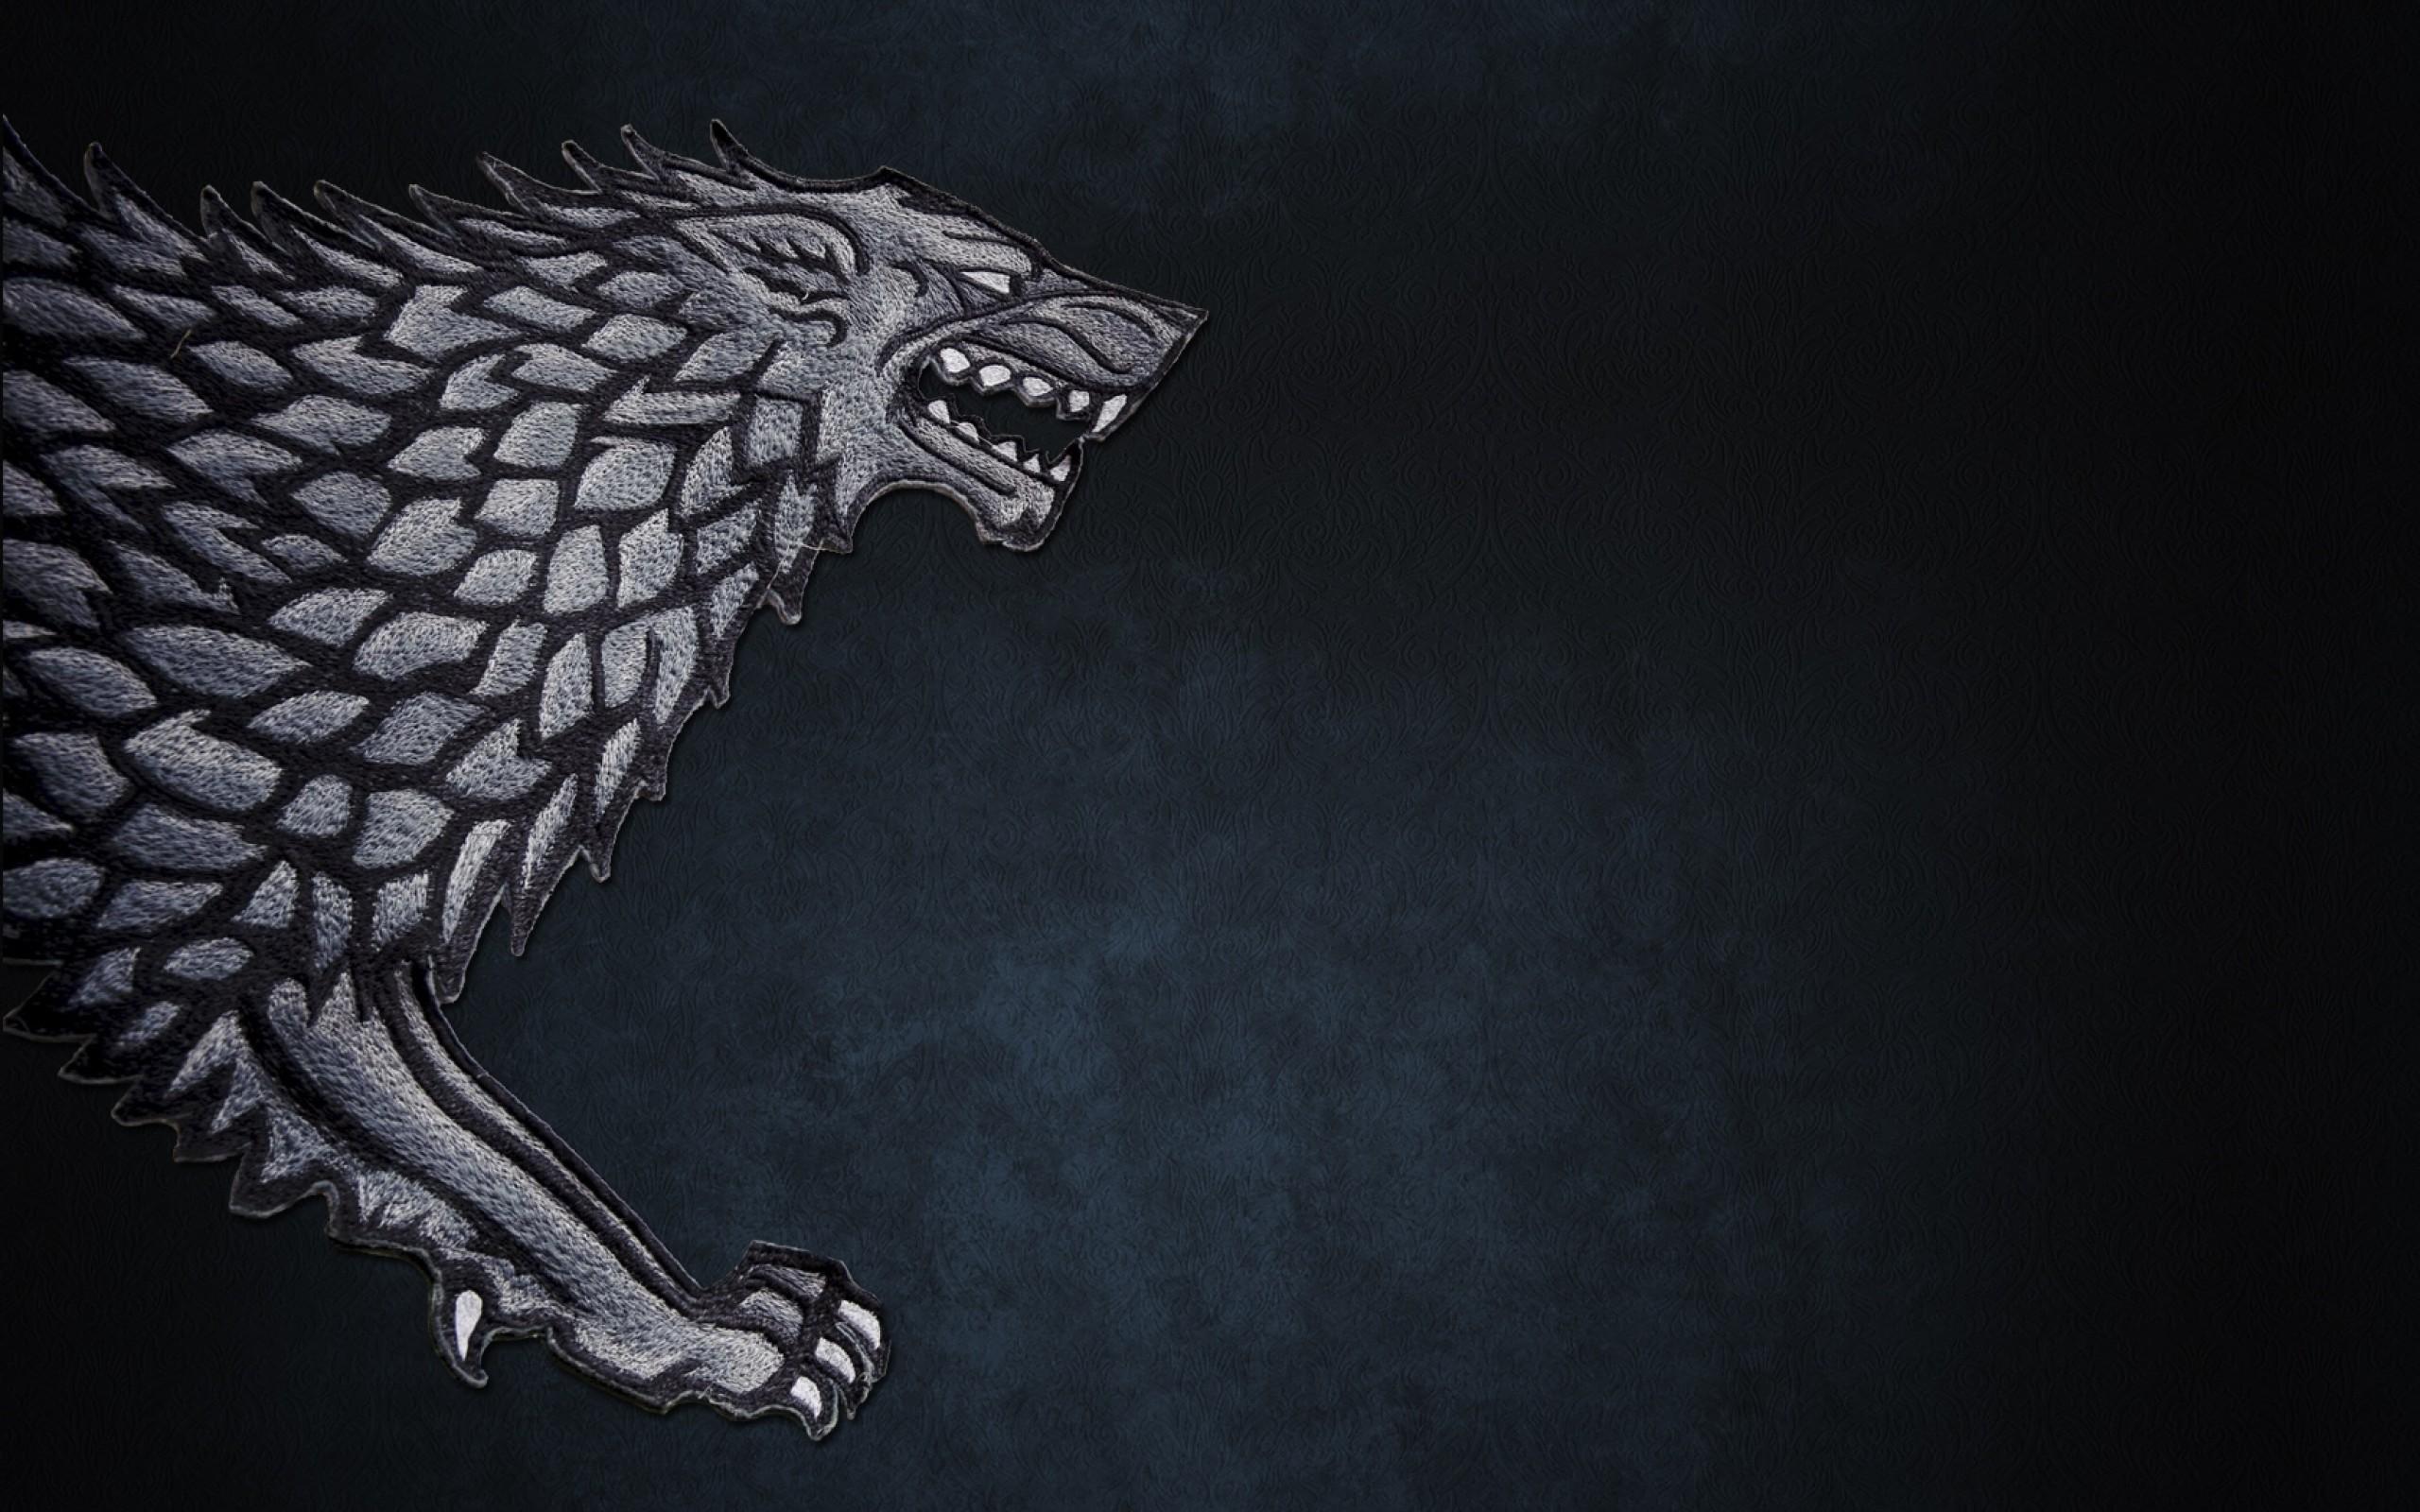 wolf, Game Of Thrones, Direwolves, Arya Stark, Artwork Wallpapers .